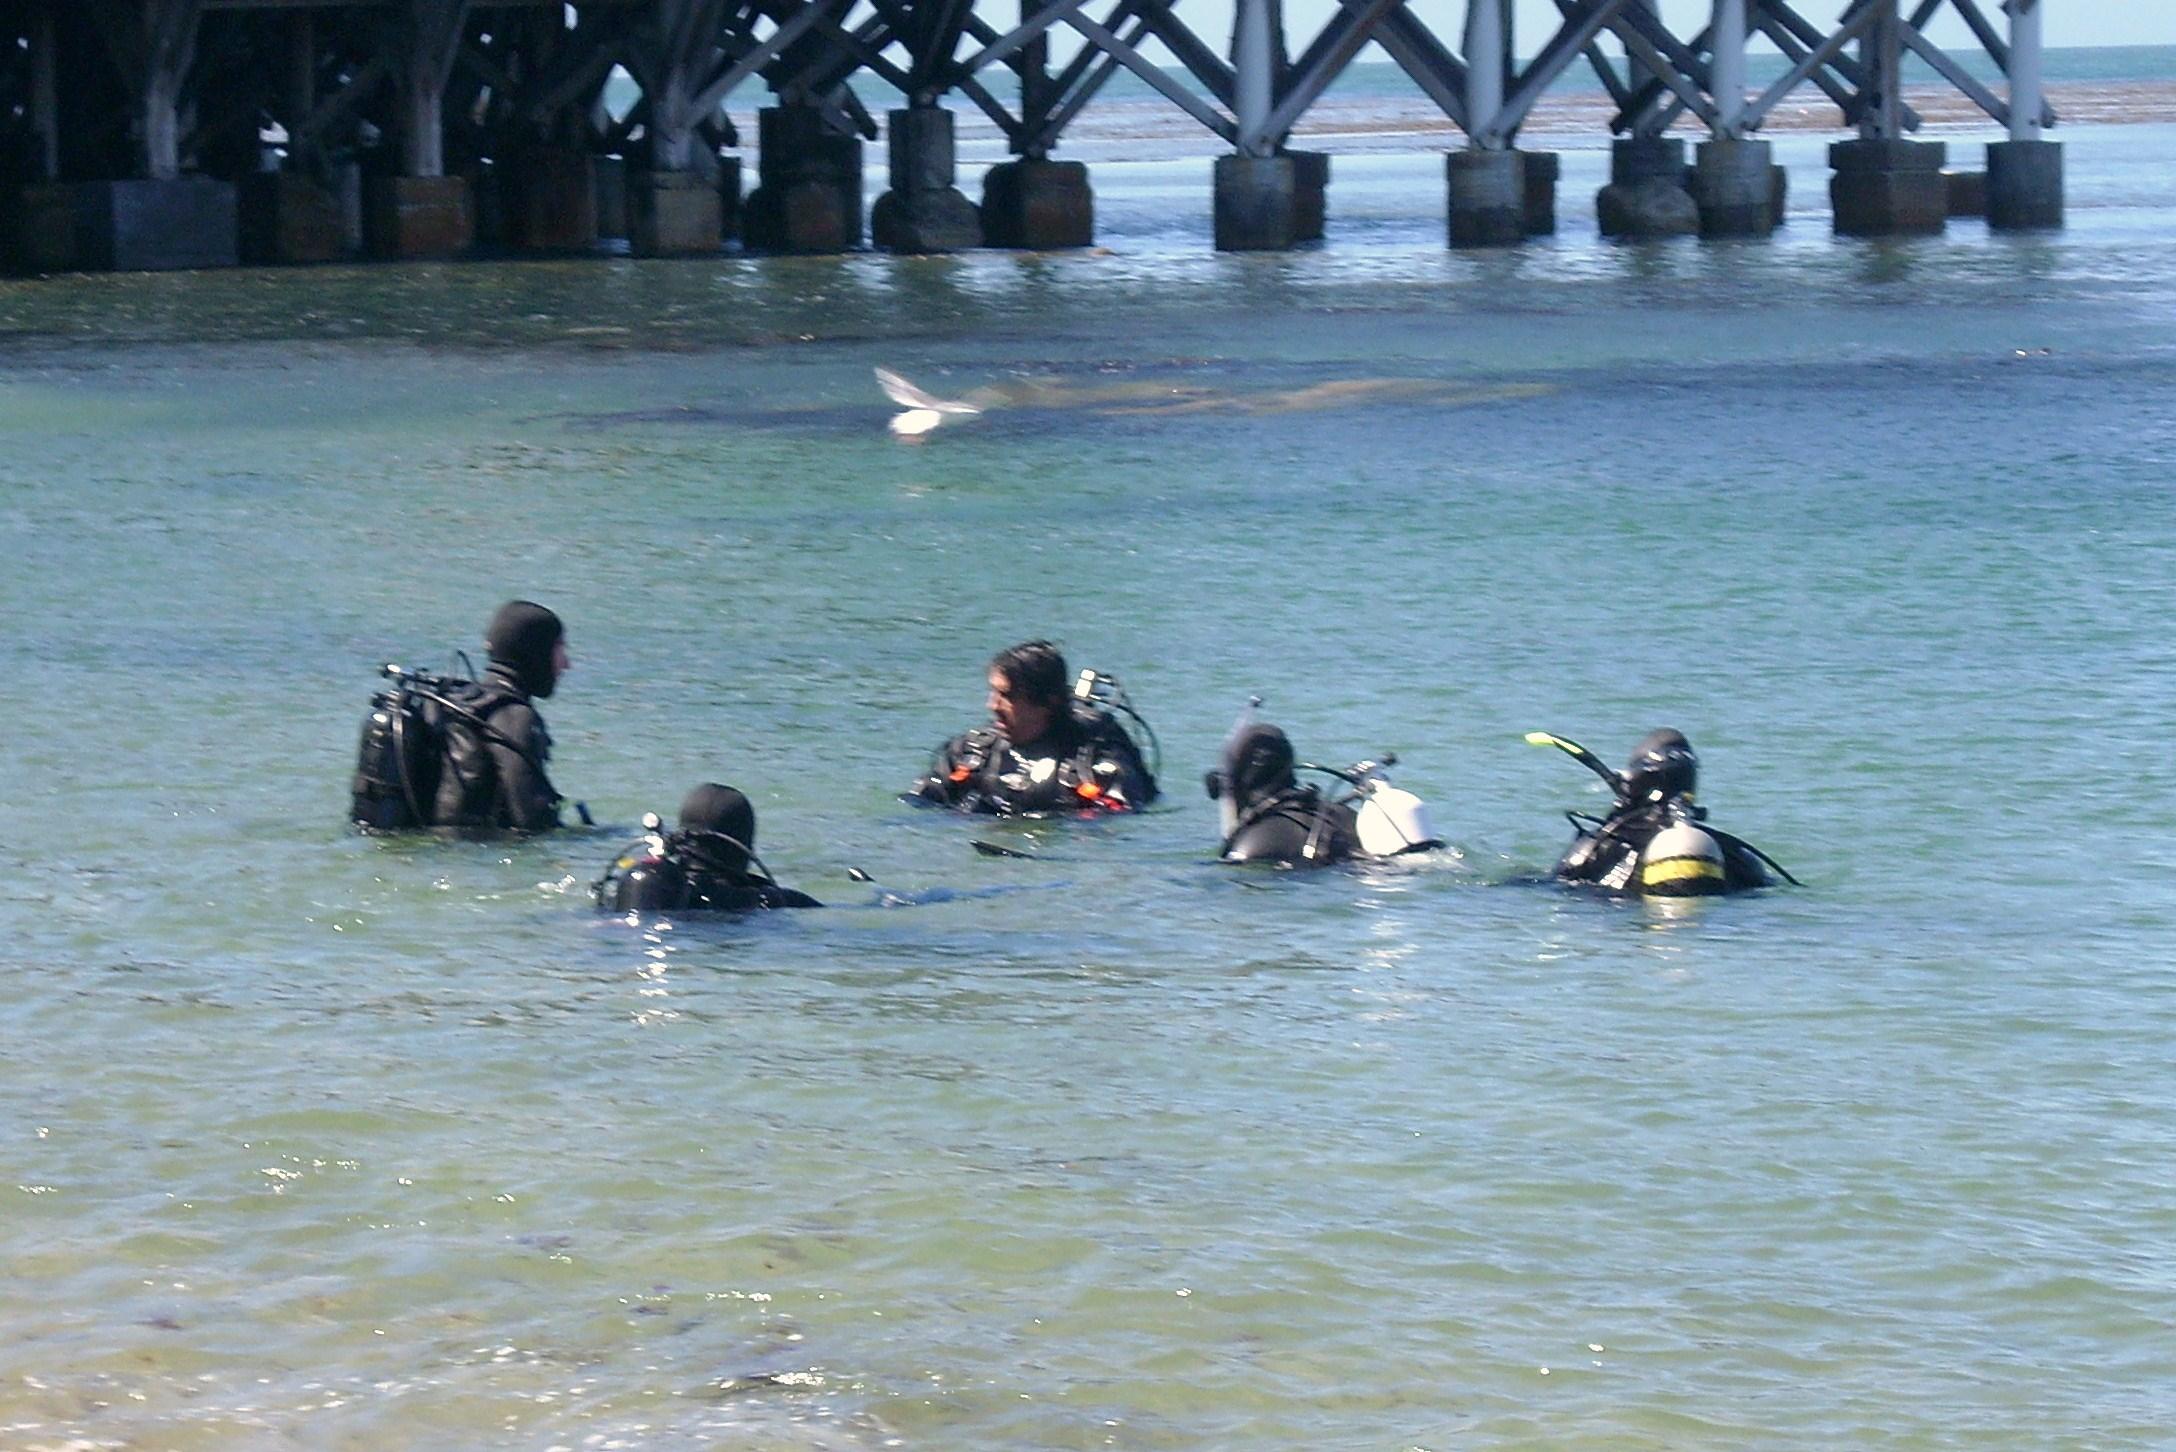 Scuba diving thesis statement